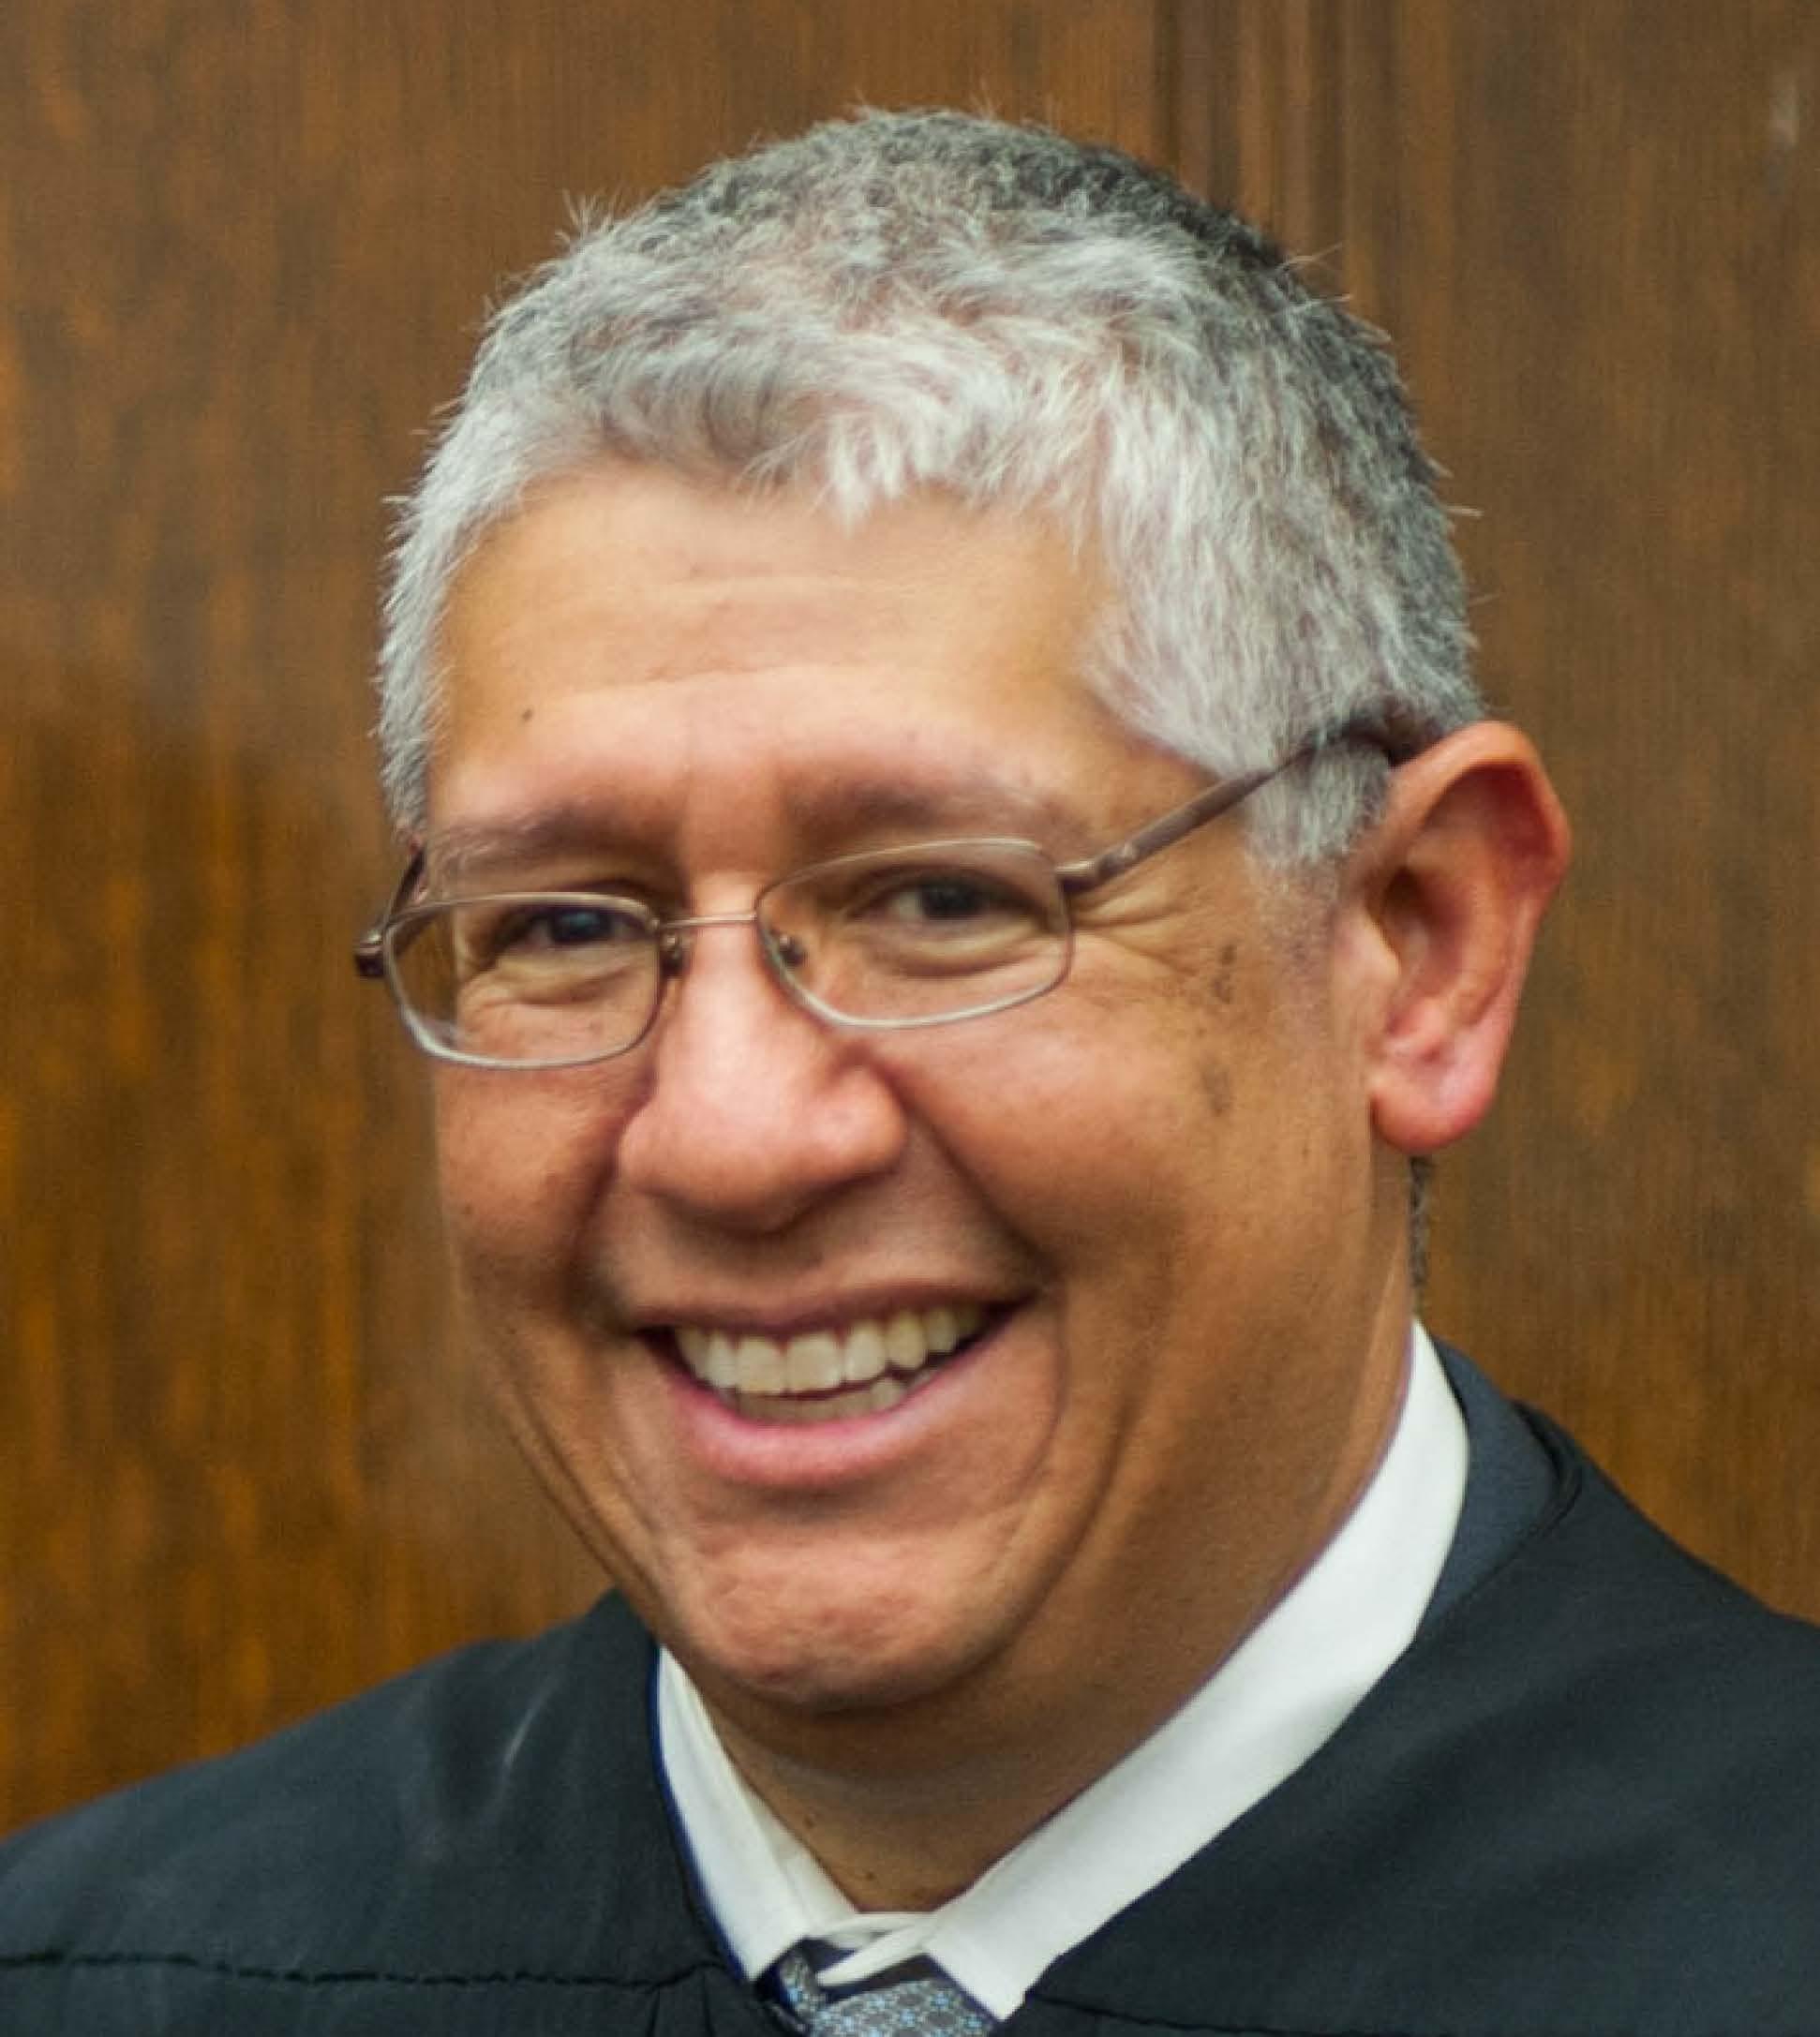 Commissioner Ruben Sundeen